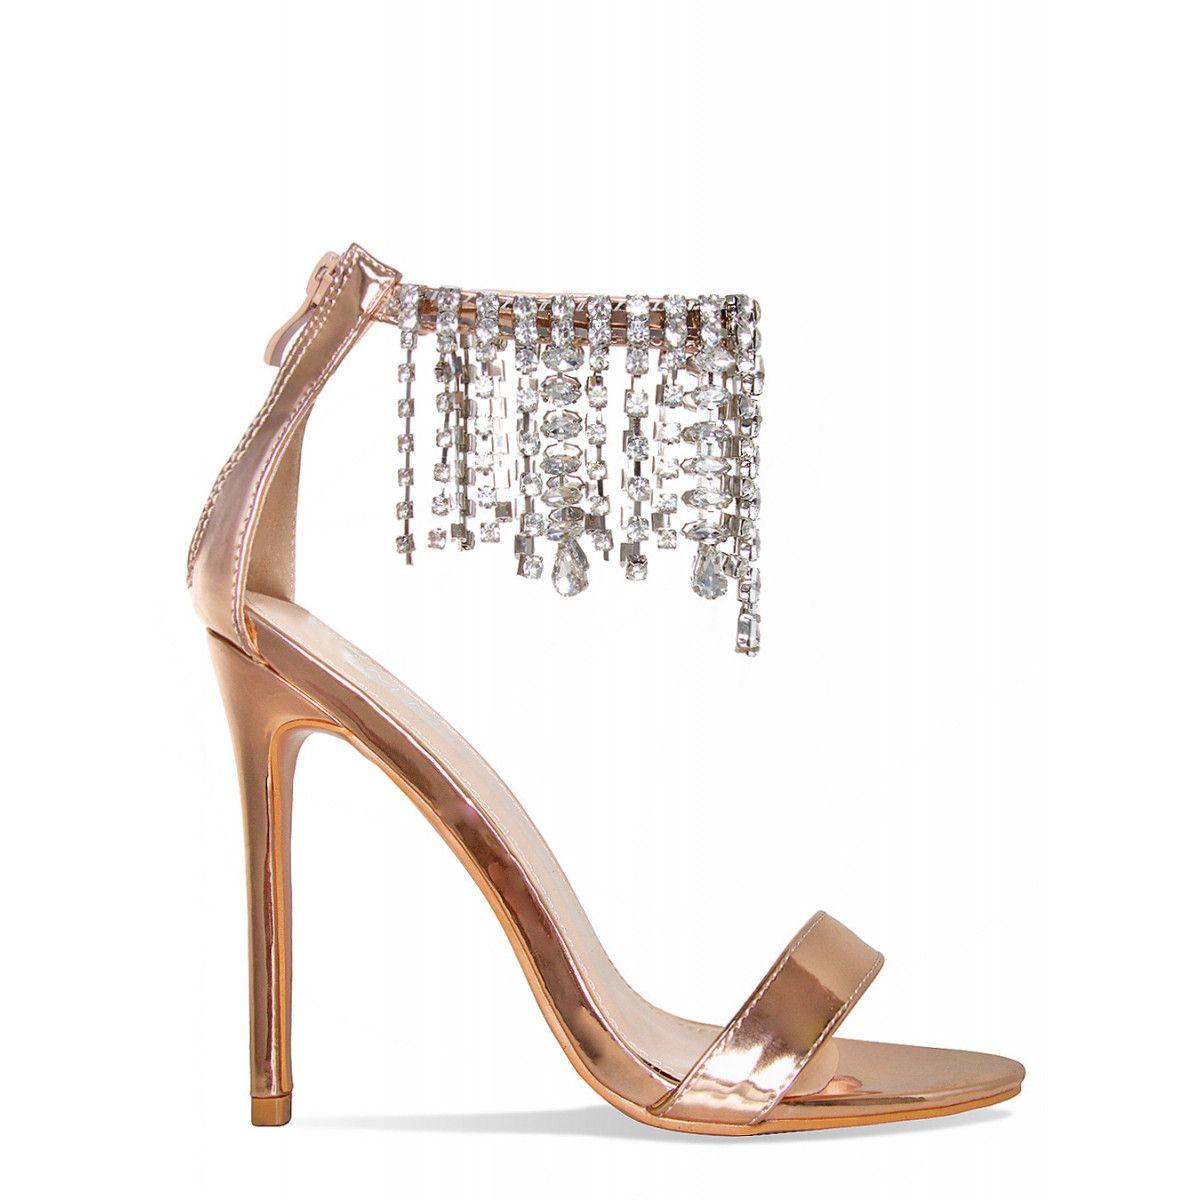 Elis There Diamonte Barely ShoesKicks Rose HeelsSimmi Gold pSzqUVMG